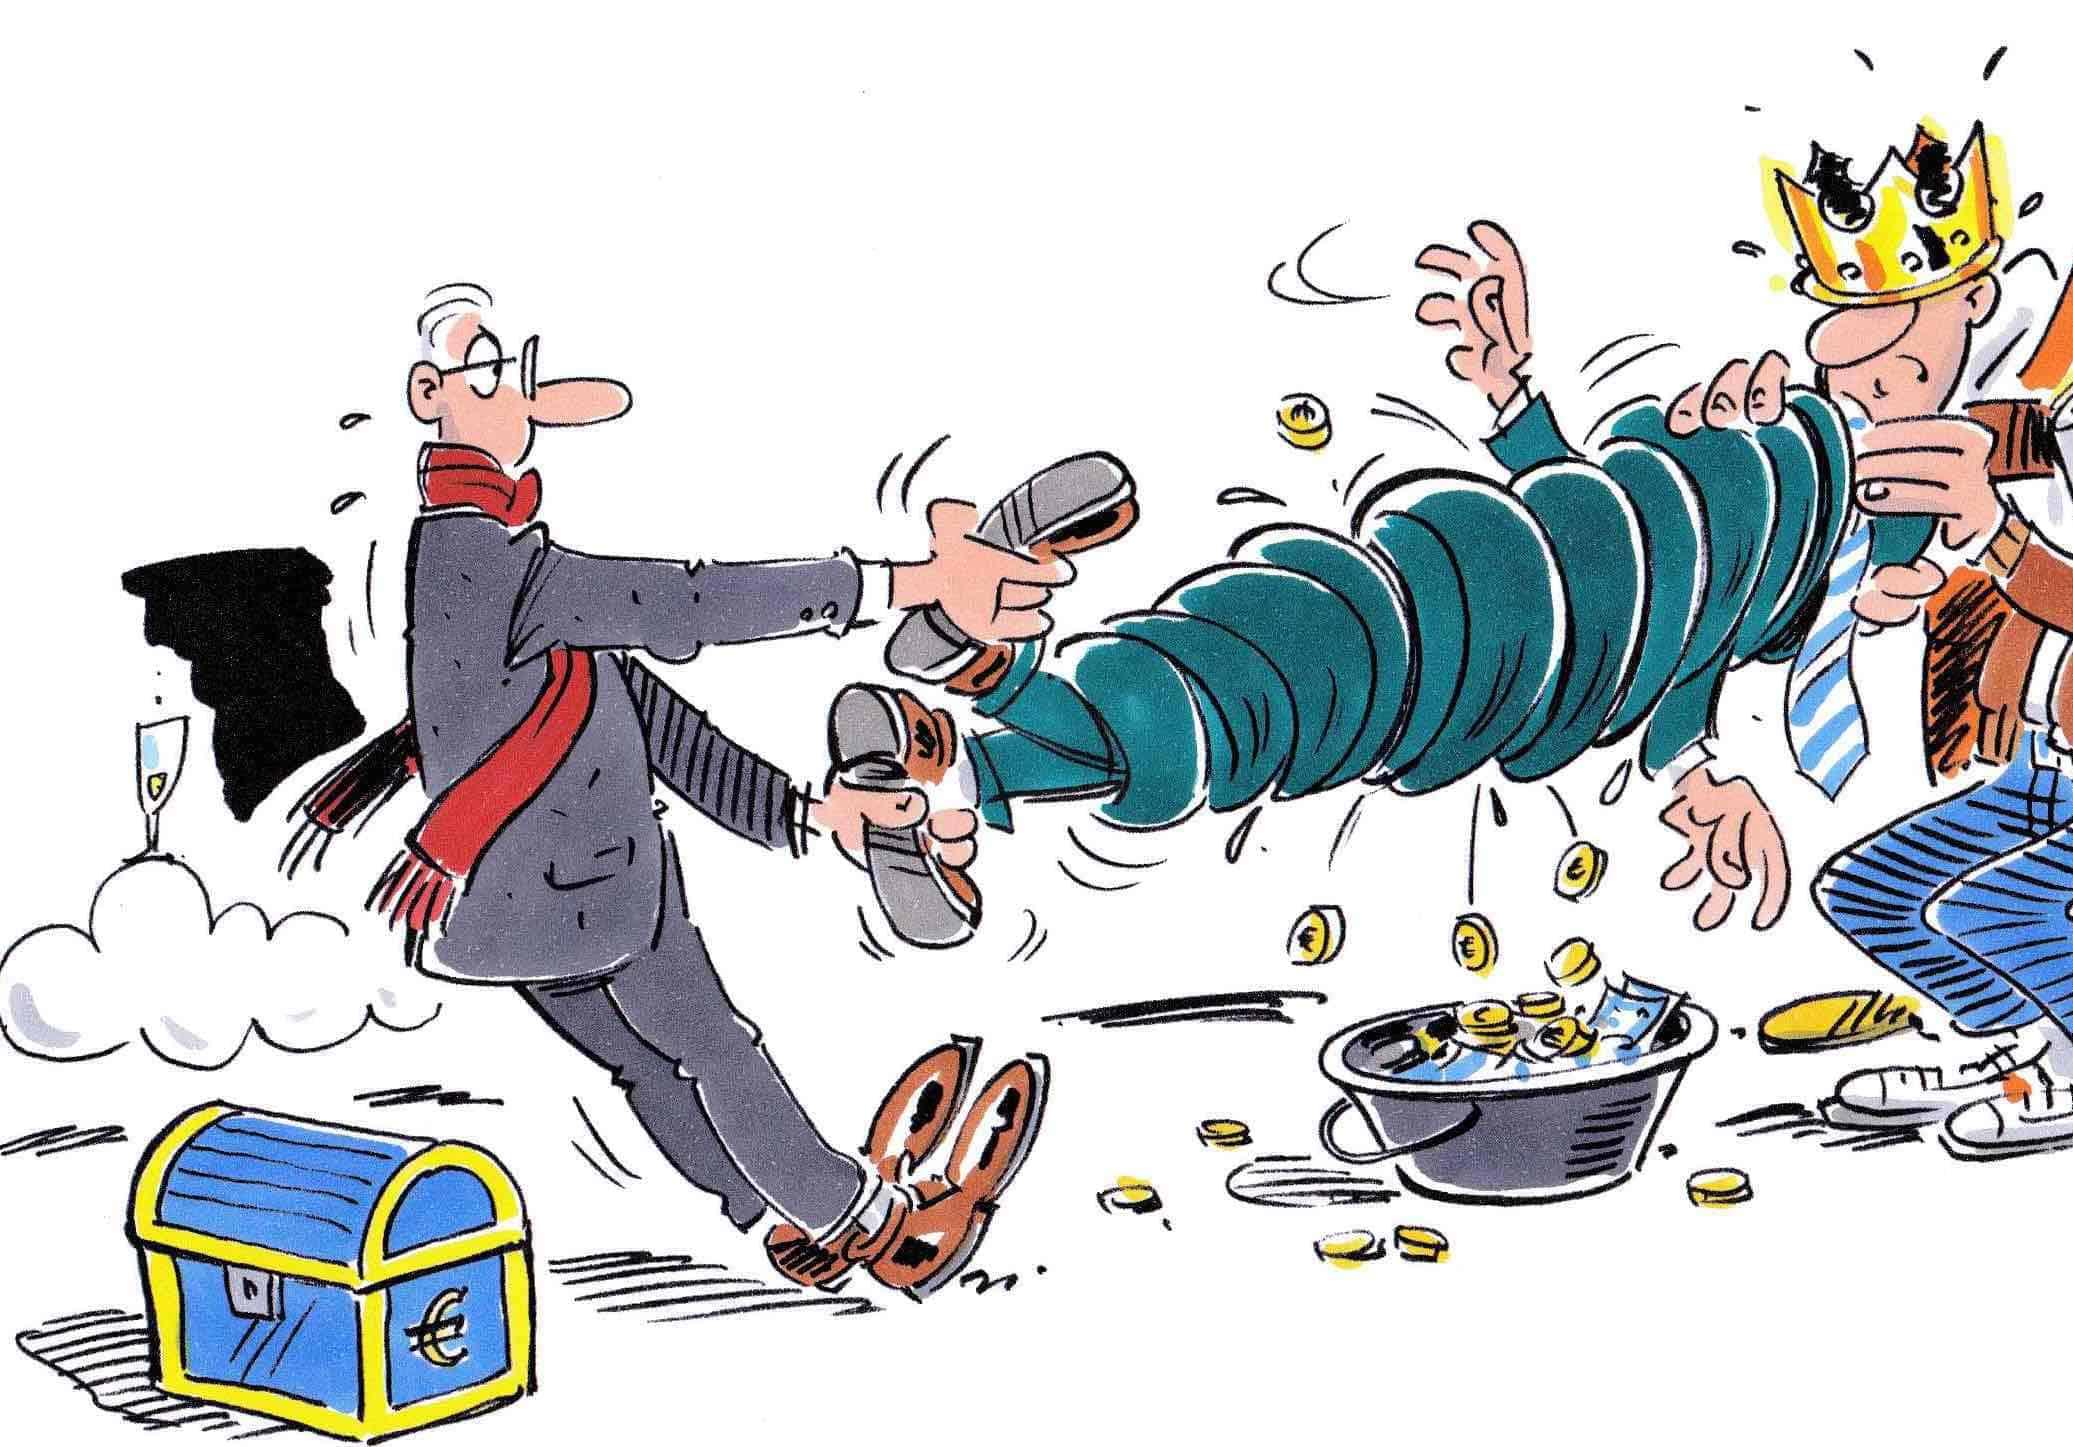 Bad Governance Regierungskritik Steuerzahler Behandlung